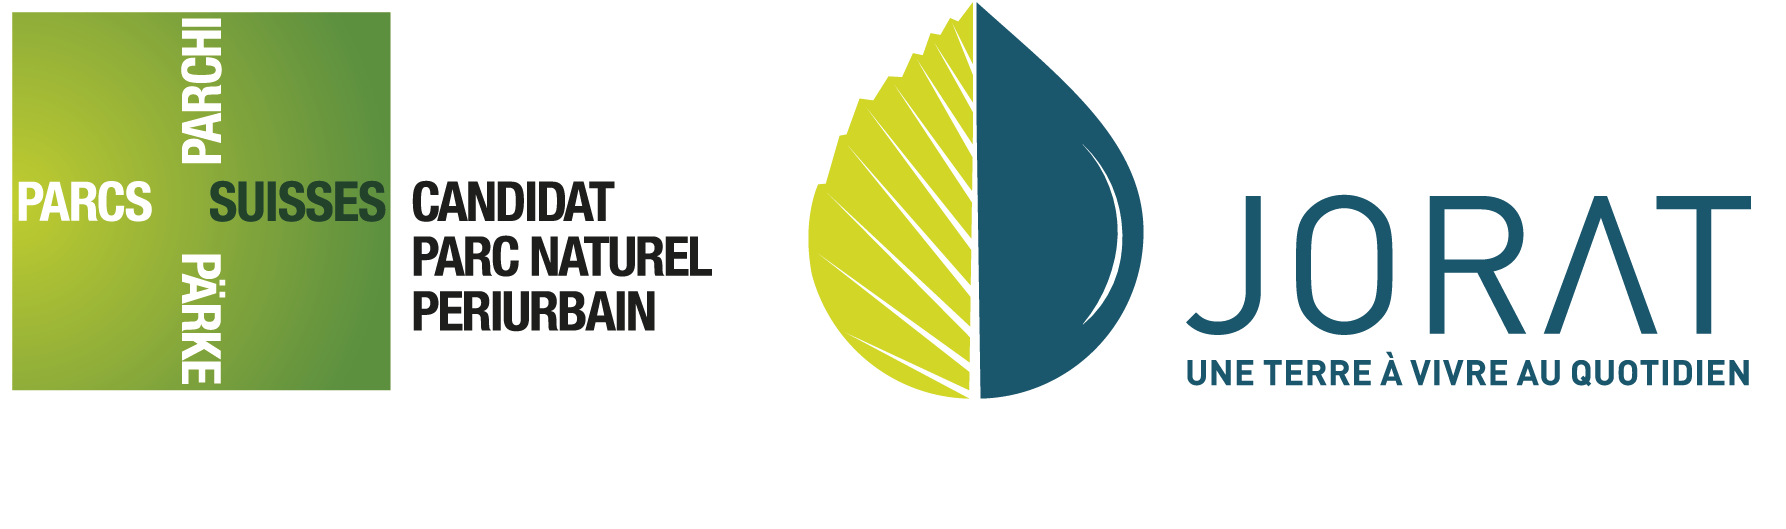 Parc naturel périurbain du Jorat